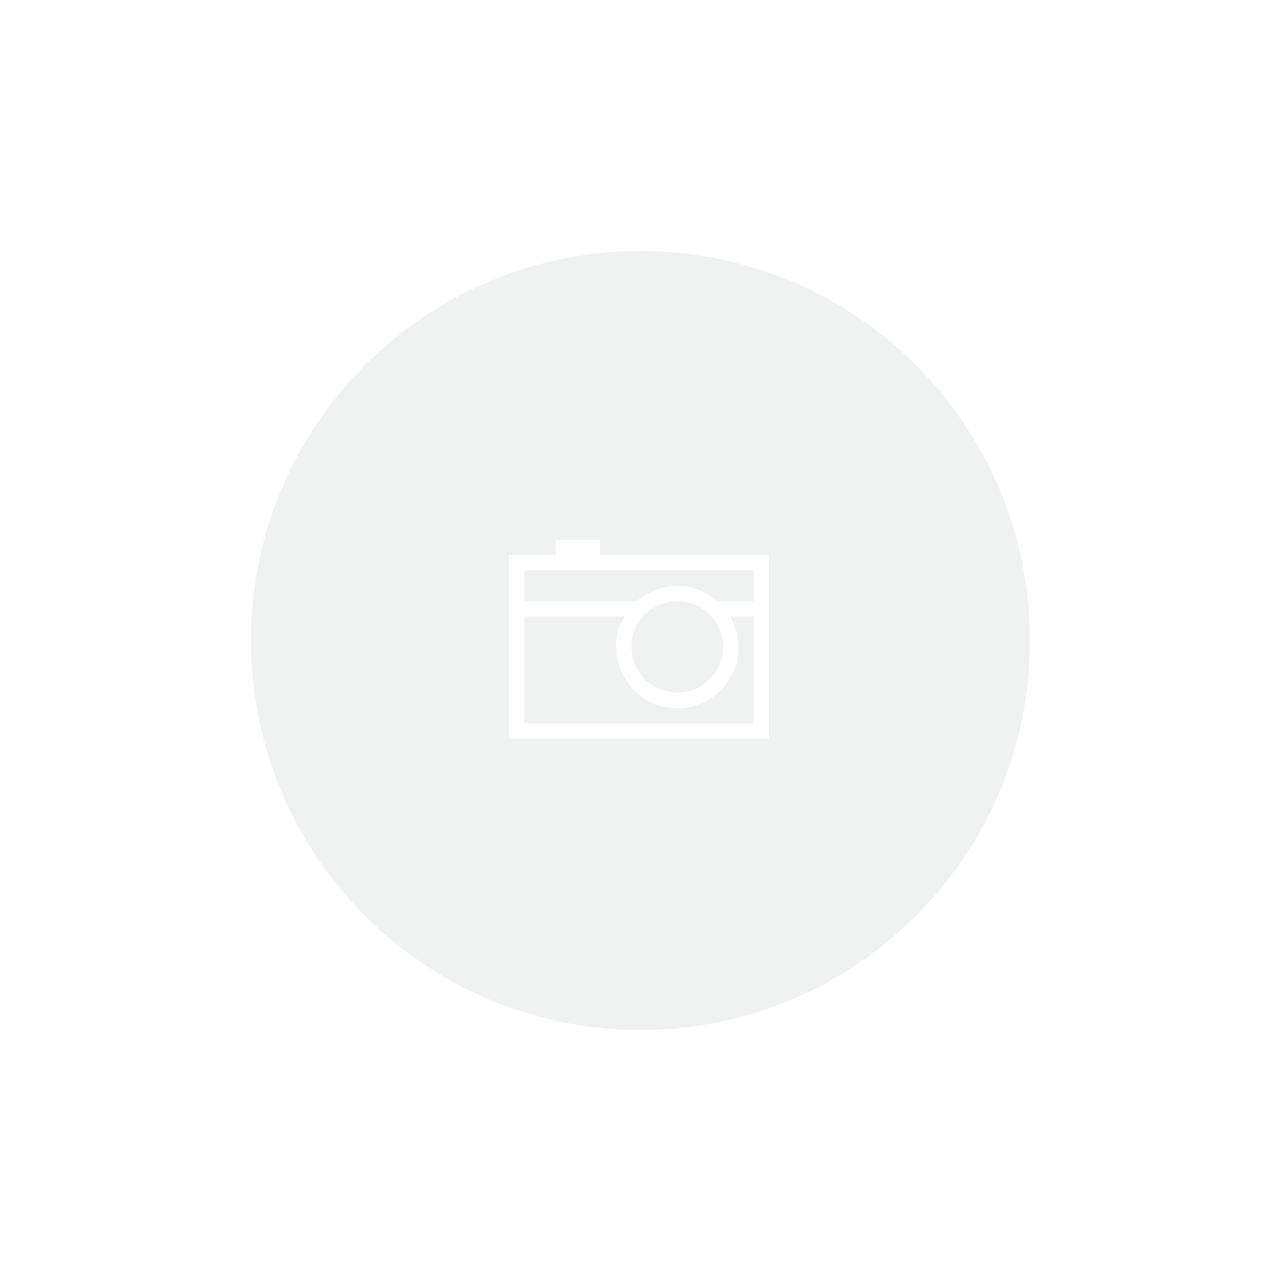 RODAS 29 BRAVE MTB BOOST GW24 28 RAIOS   Pedalokos Bike Shop